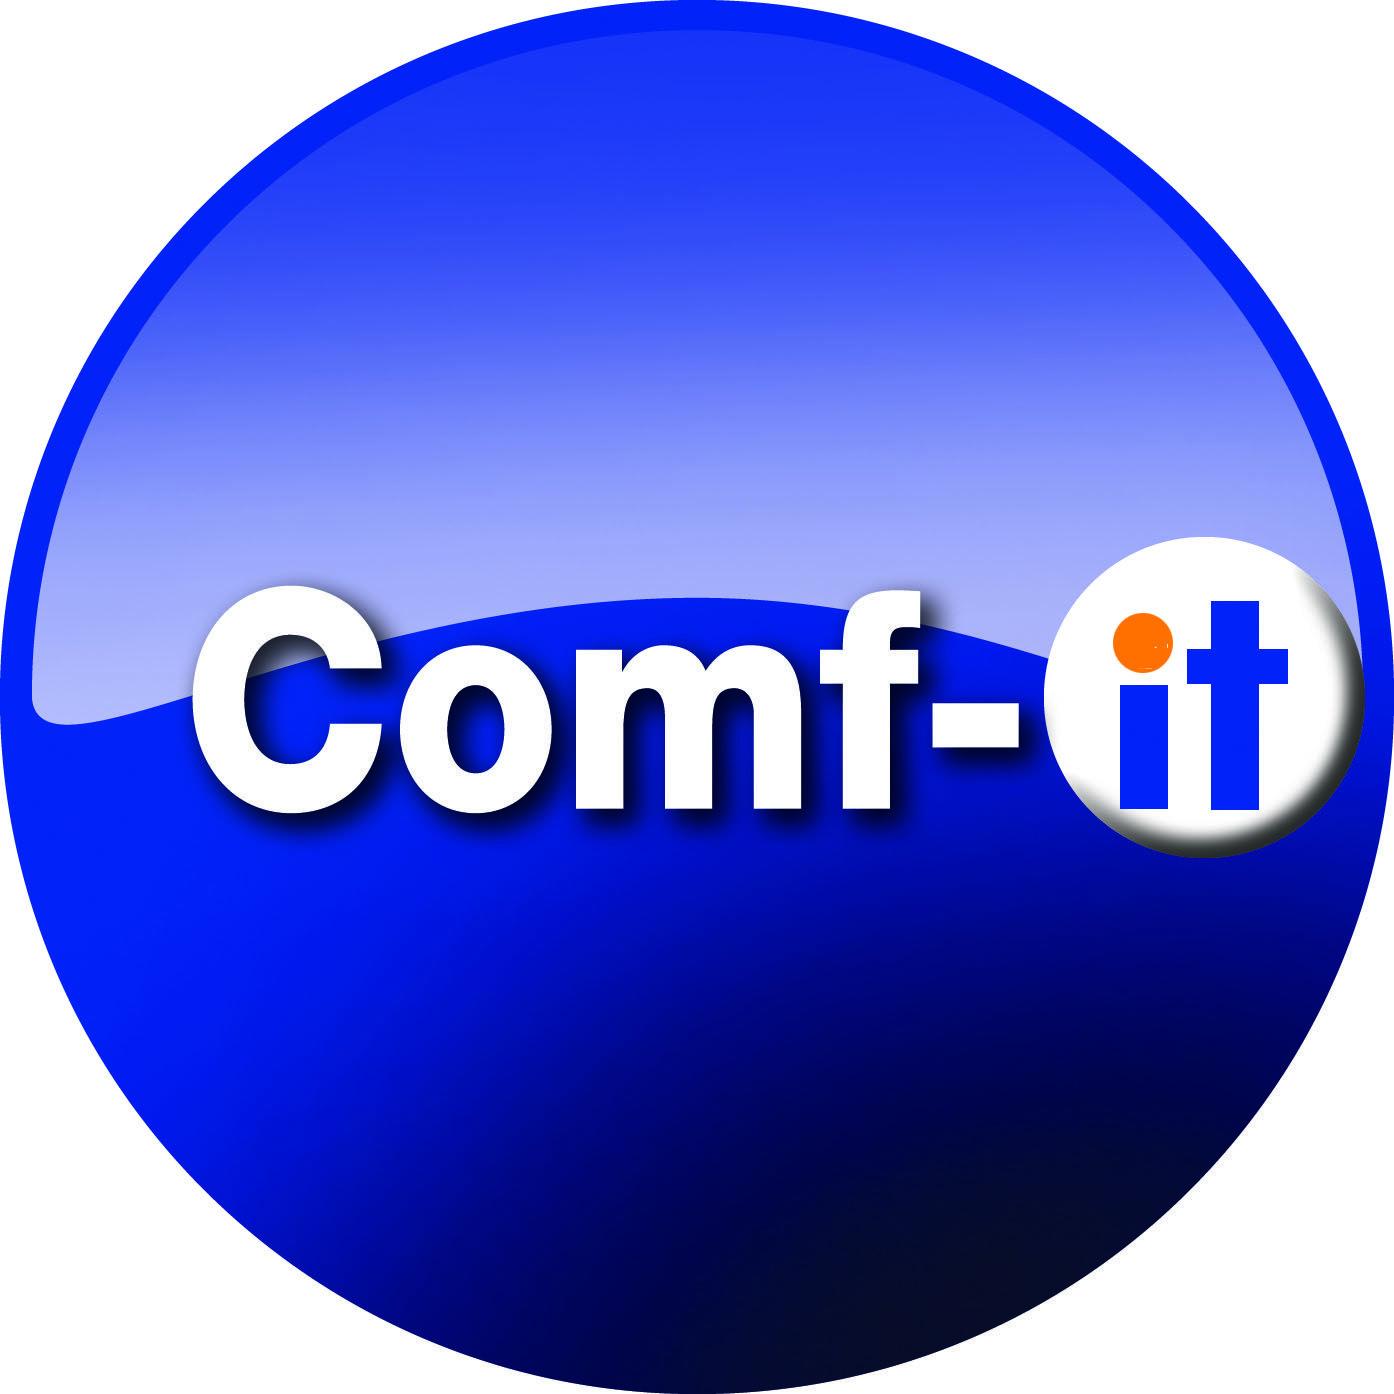 Our Comf-iT Range